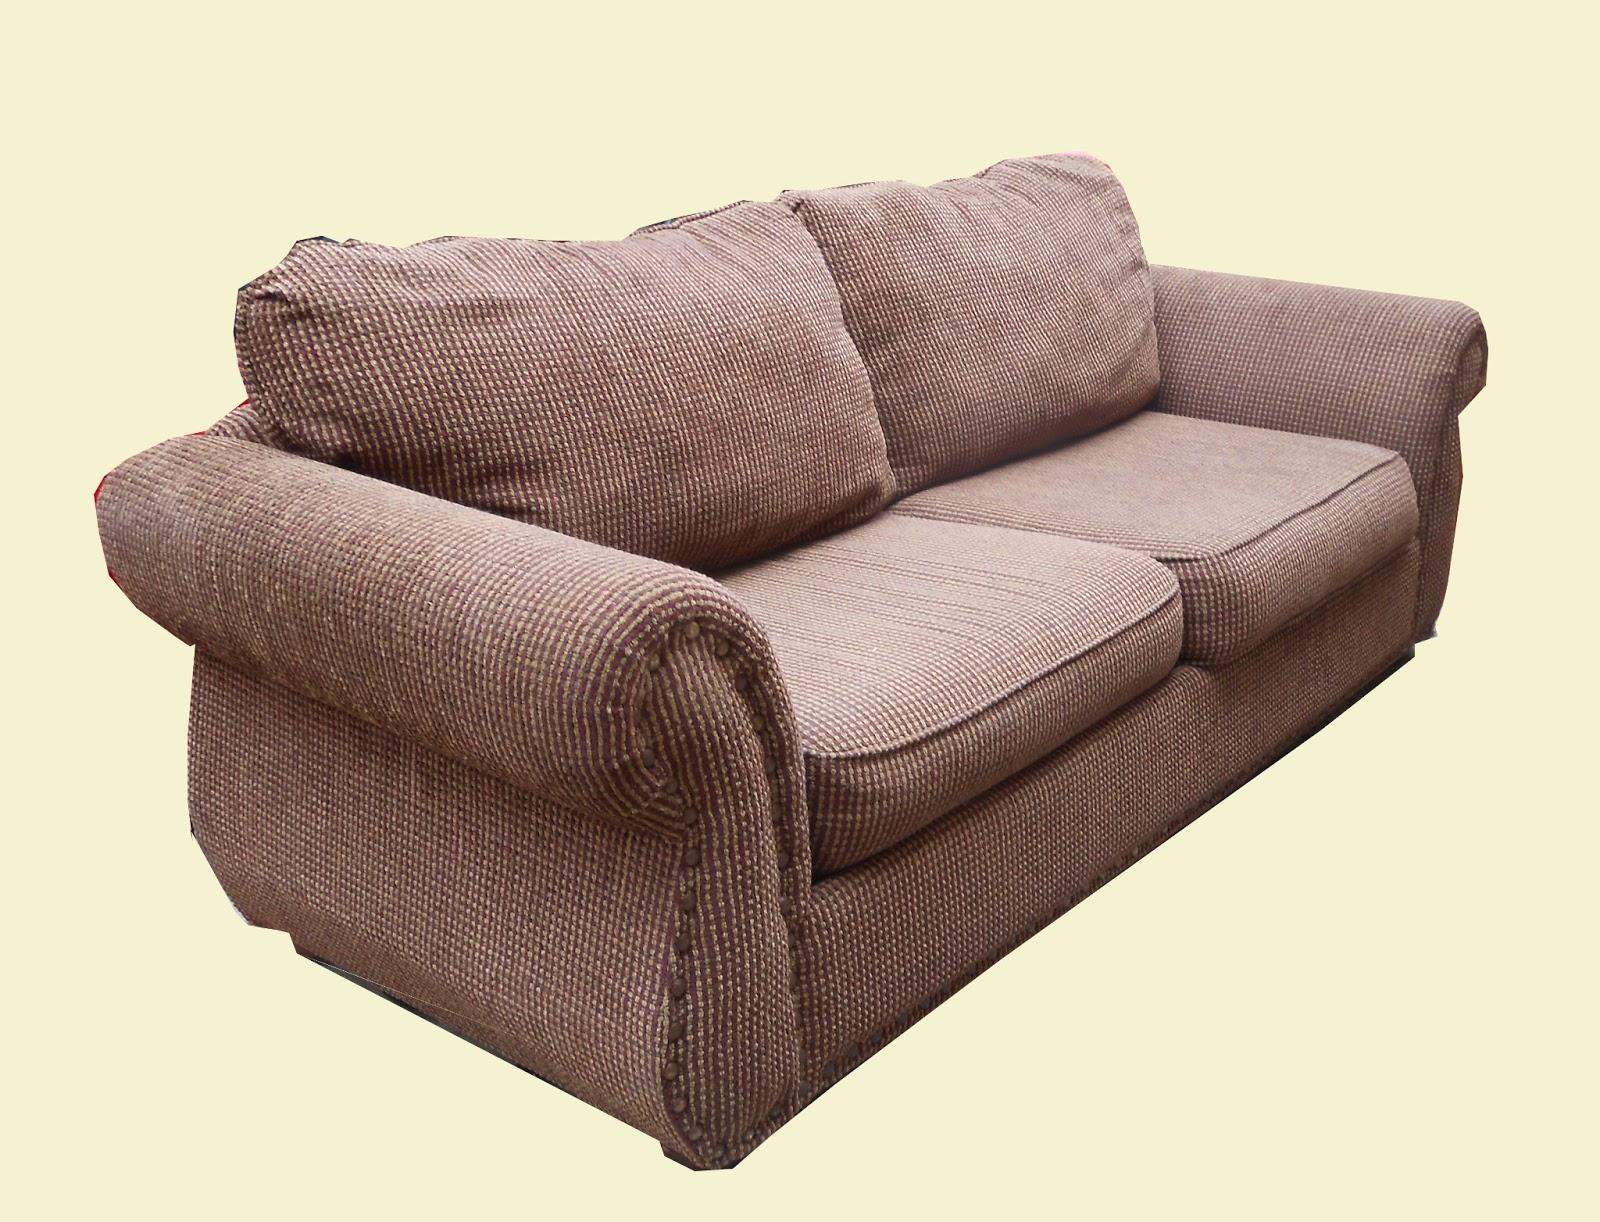 Uhuru Furniture amp Collectibles CordovanTan Chenille Sofa  : DSCN2638 from uhurufurniturephilly.blogspot.com size 1600 x 1222 jpeg 414kB